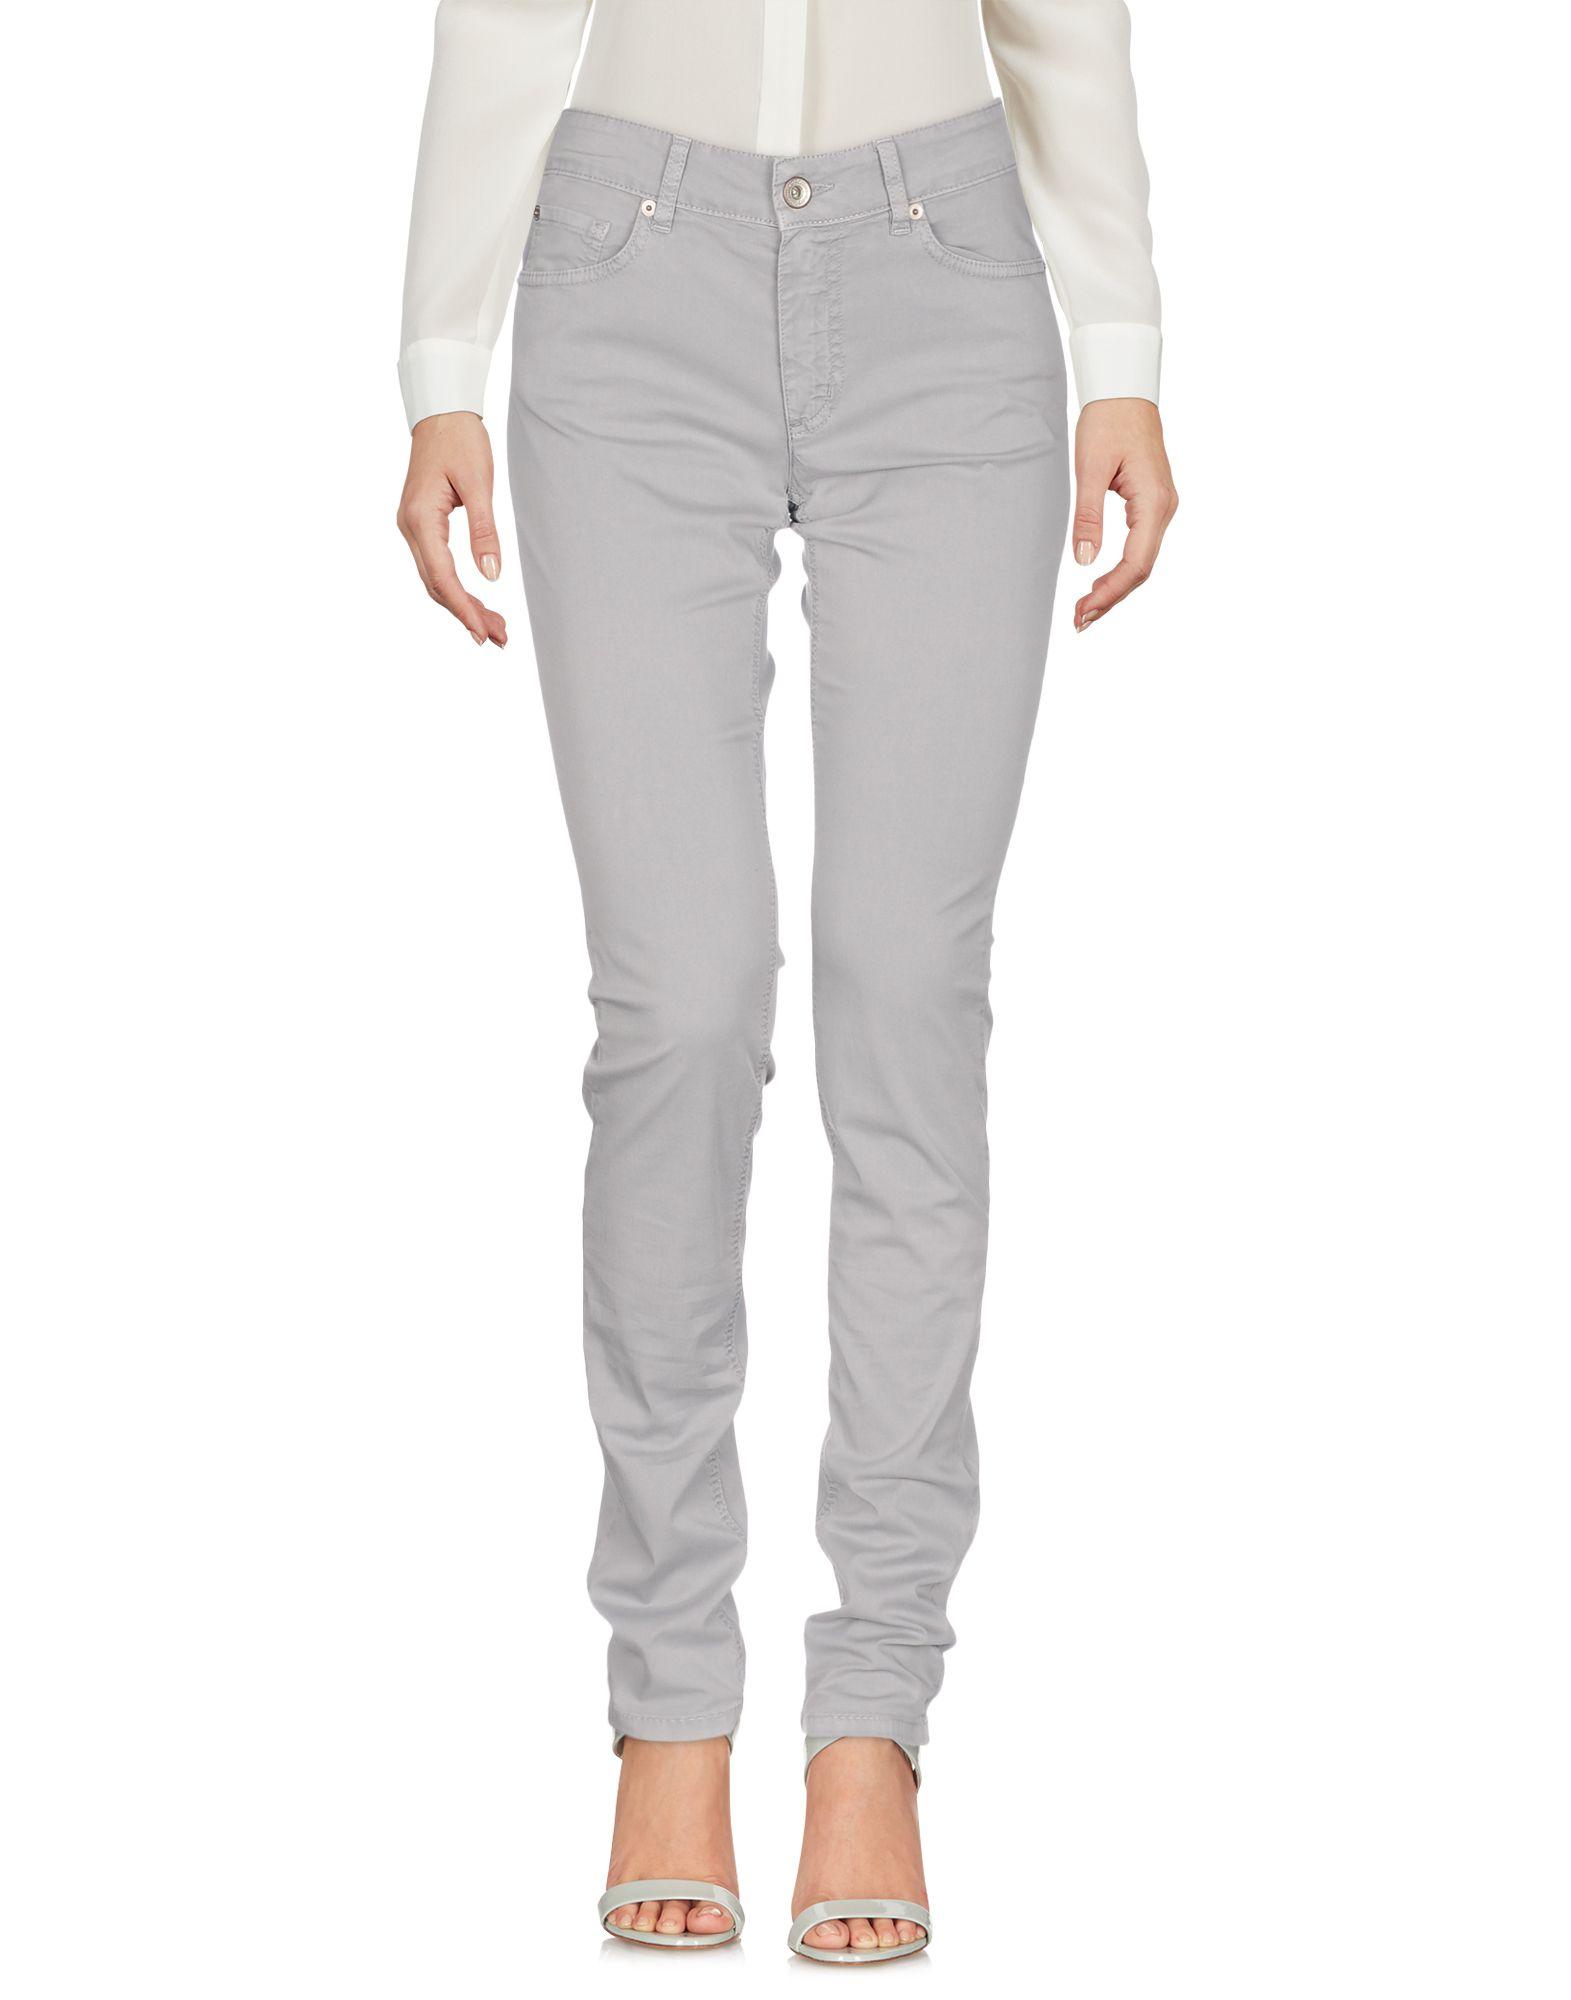 HENRY COTTON'S Повседневные брюки брюки liu jo f63215t7297 р 29 int